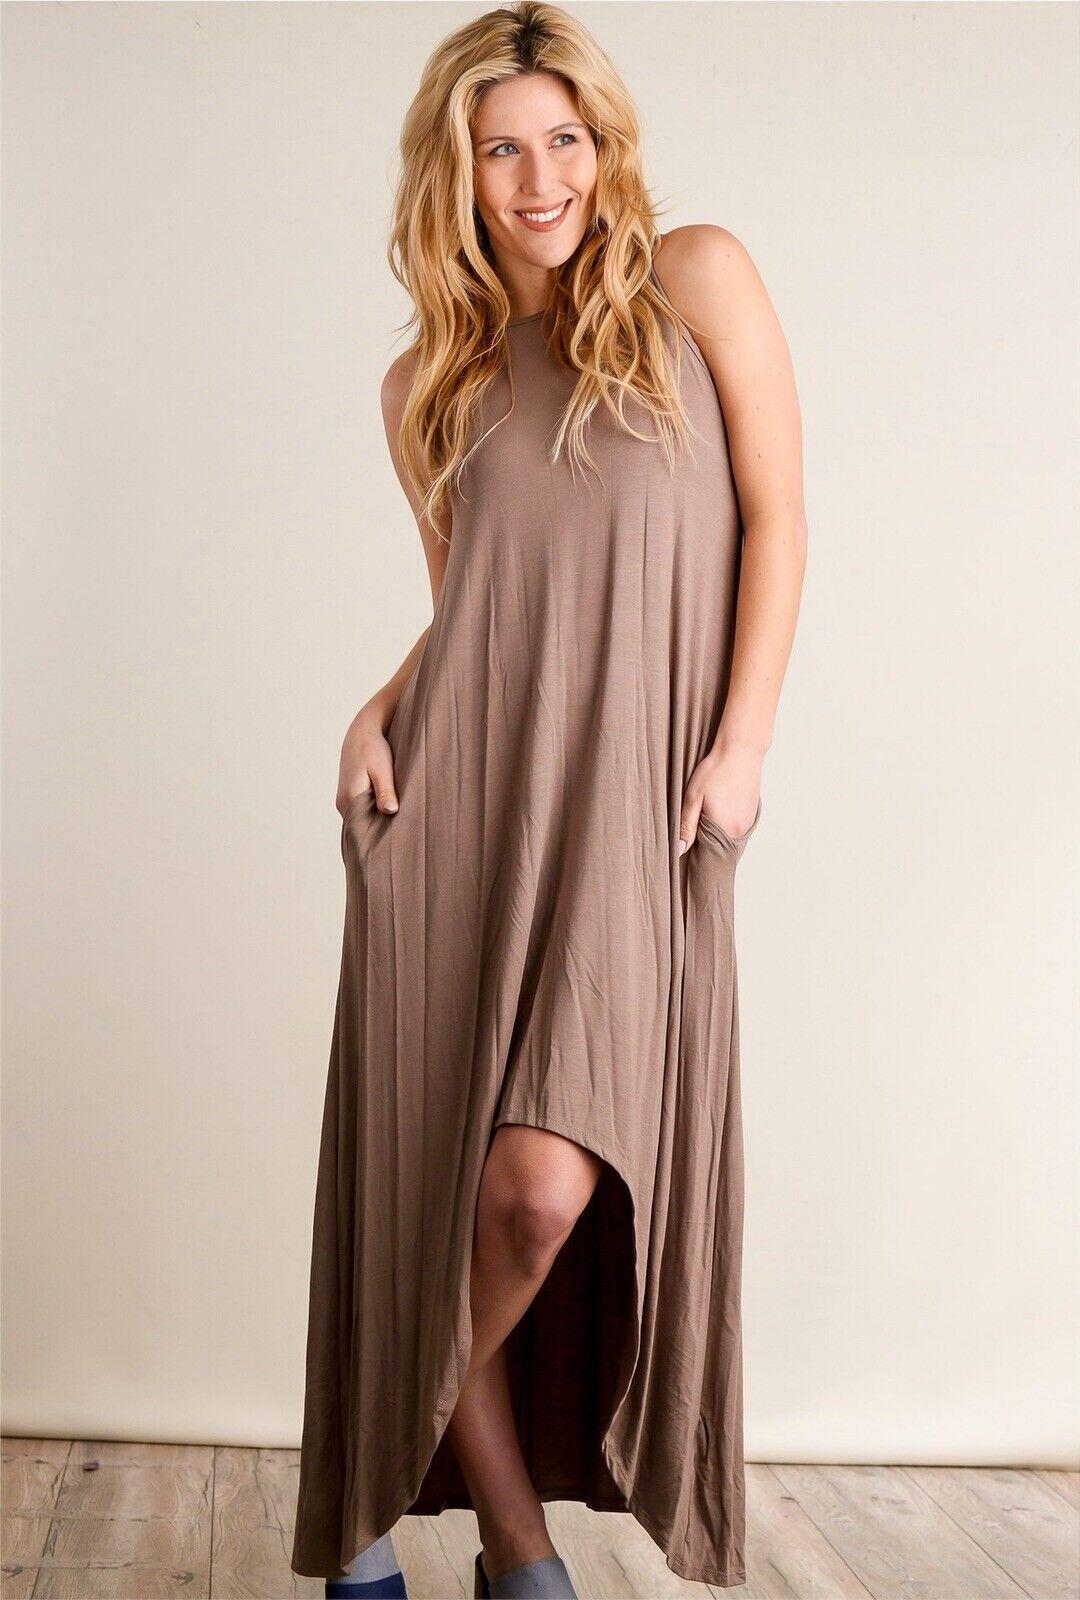 a39b04cf1d23 Boutique Clothing Bellamie Maxi Mocha T-Shirt Tank Soft Dress W Pockets XL